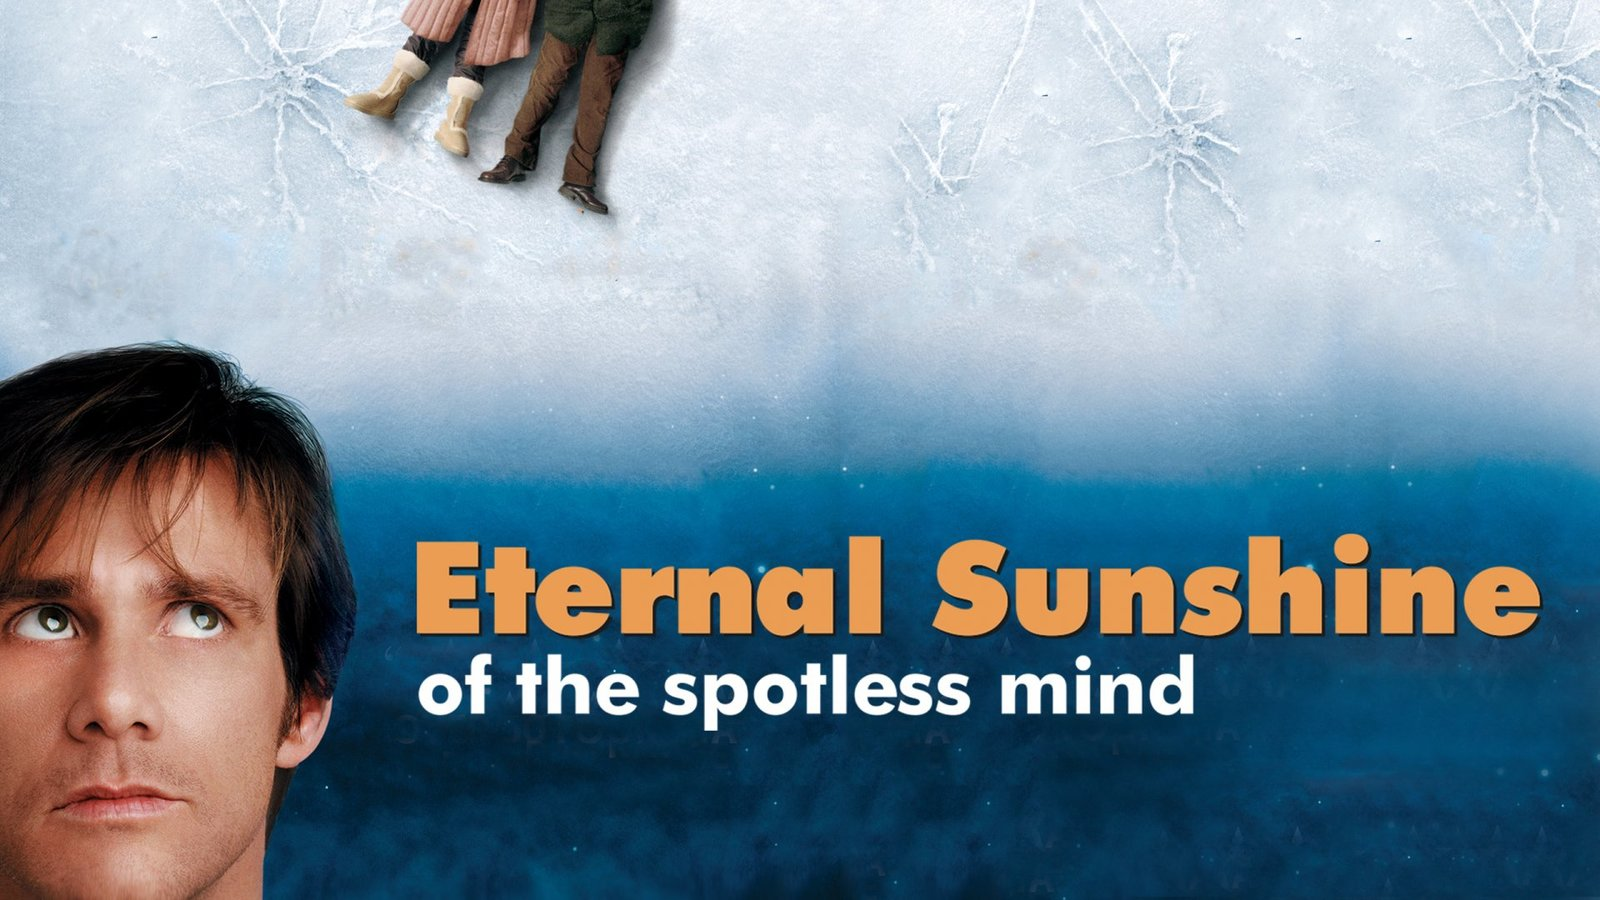 Movie Club Eternal Sunshine Of The Spotless Mind Upper St Clair